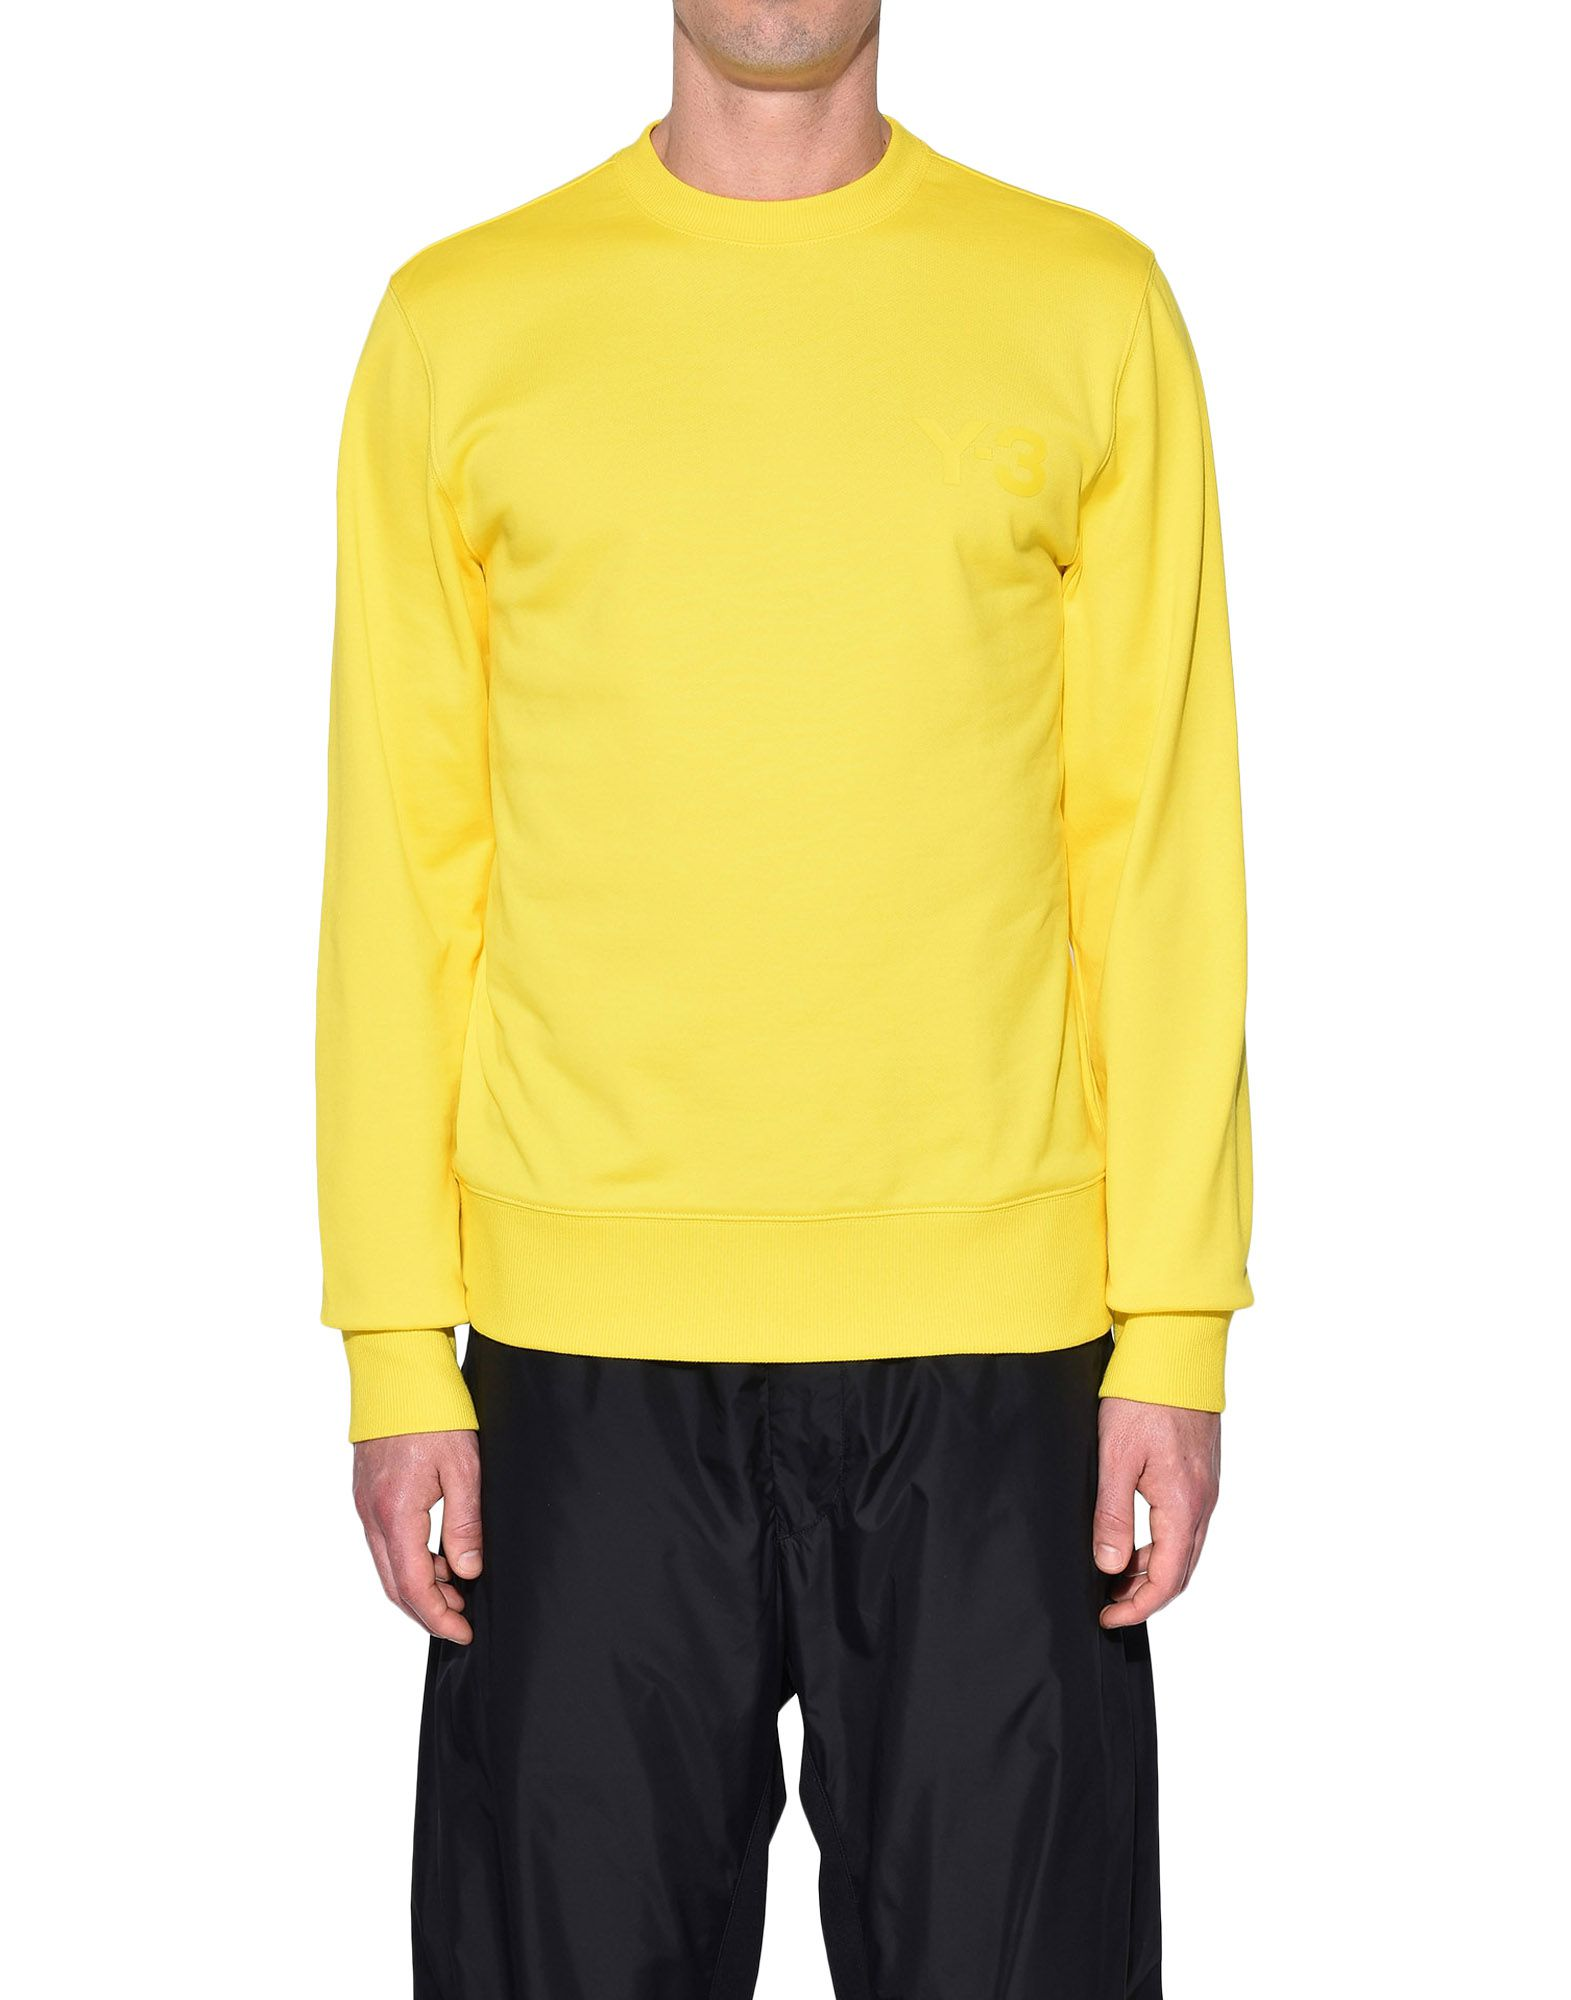 Y-3 Y-3 Classic Sweater スウェット メンズ r